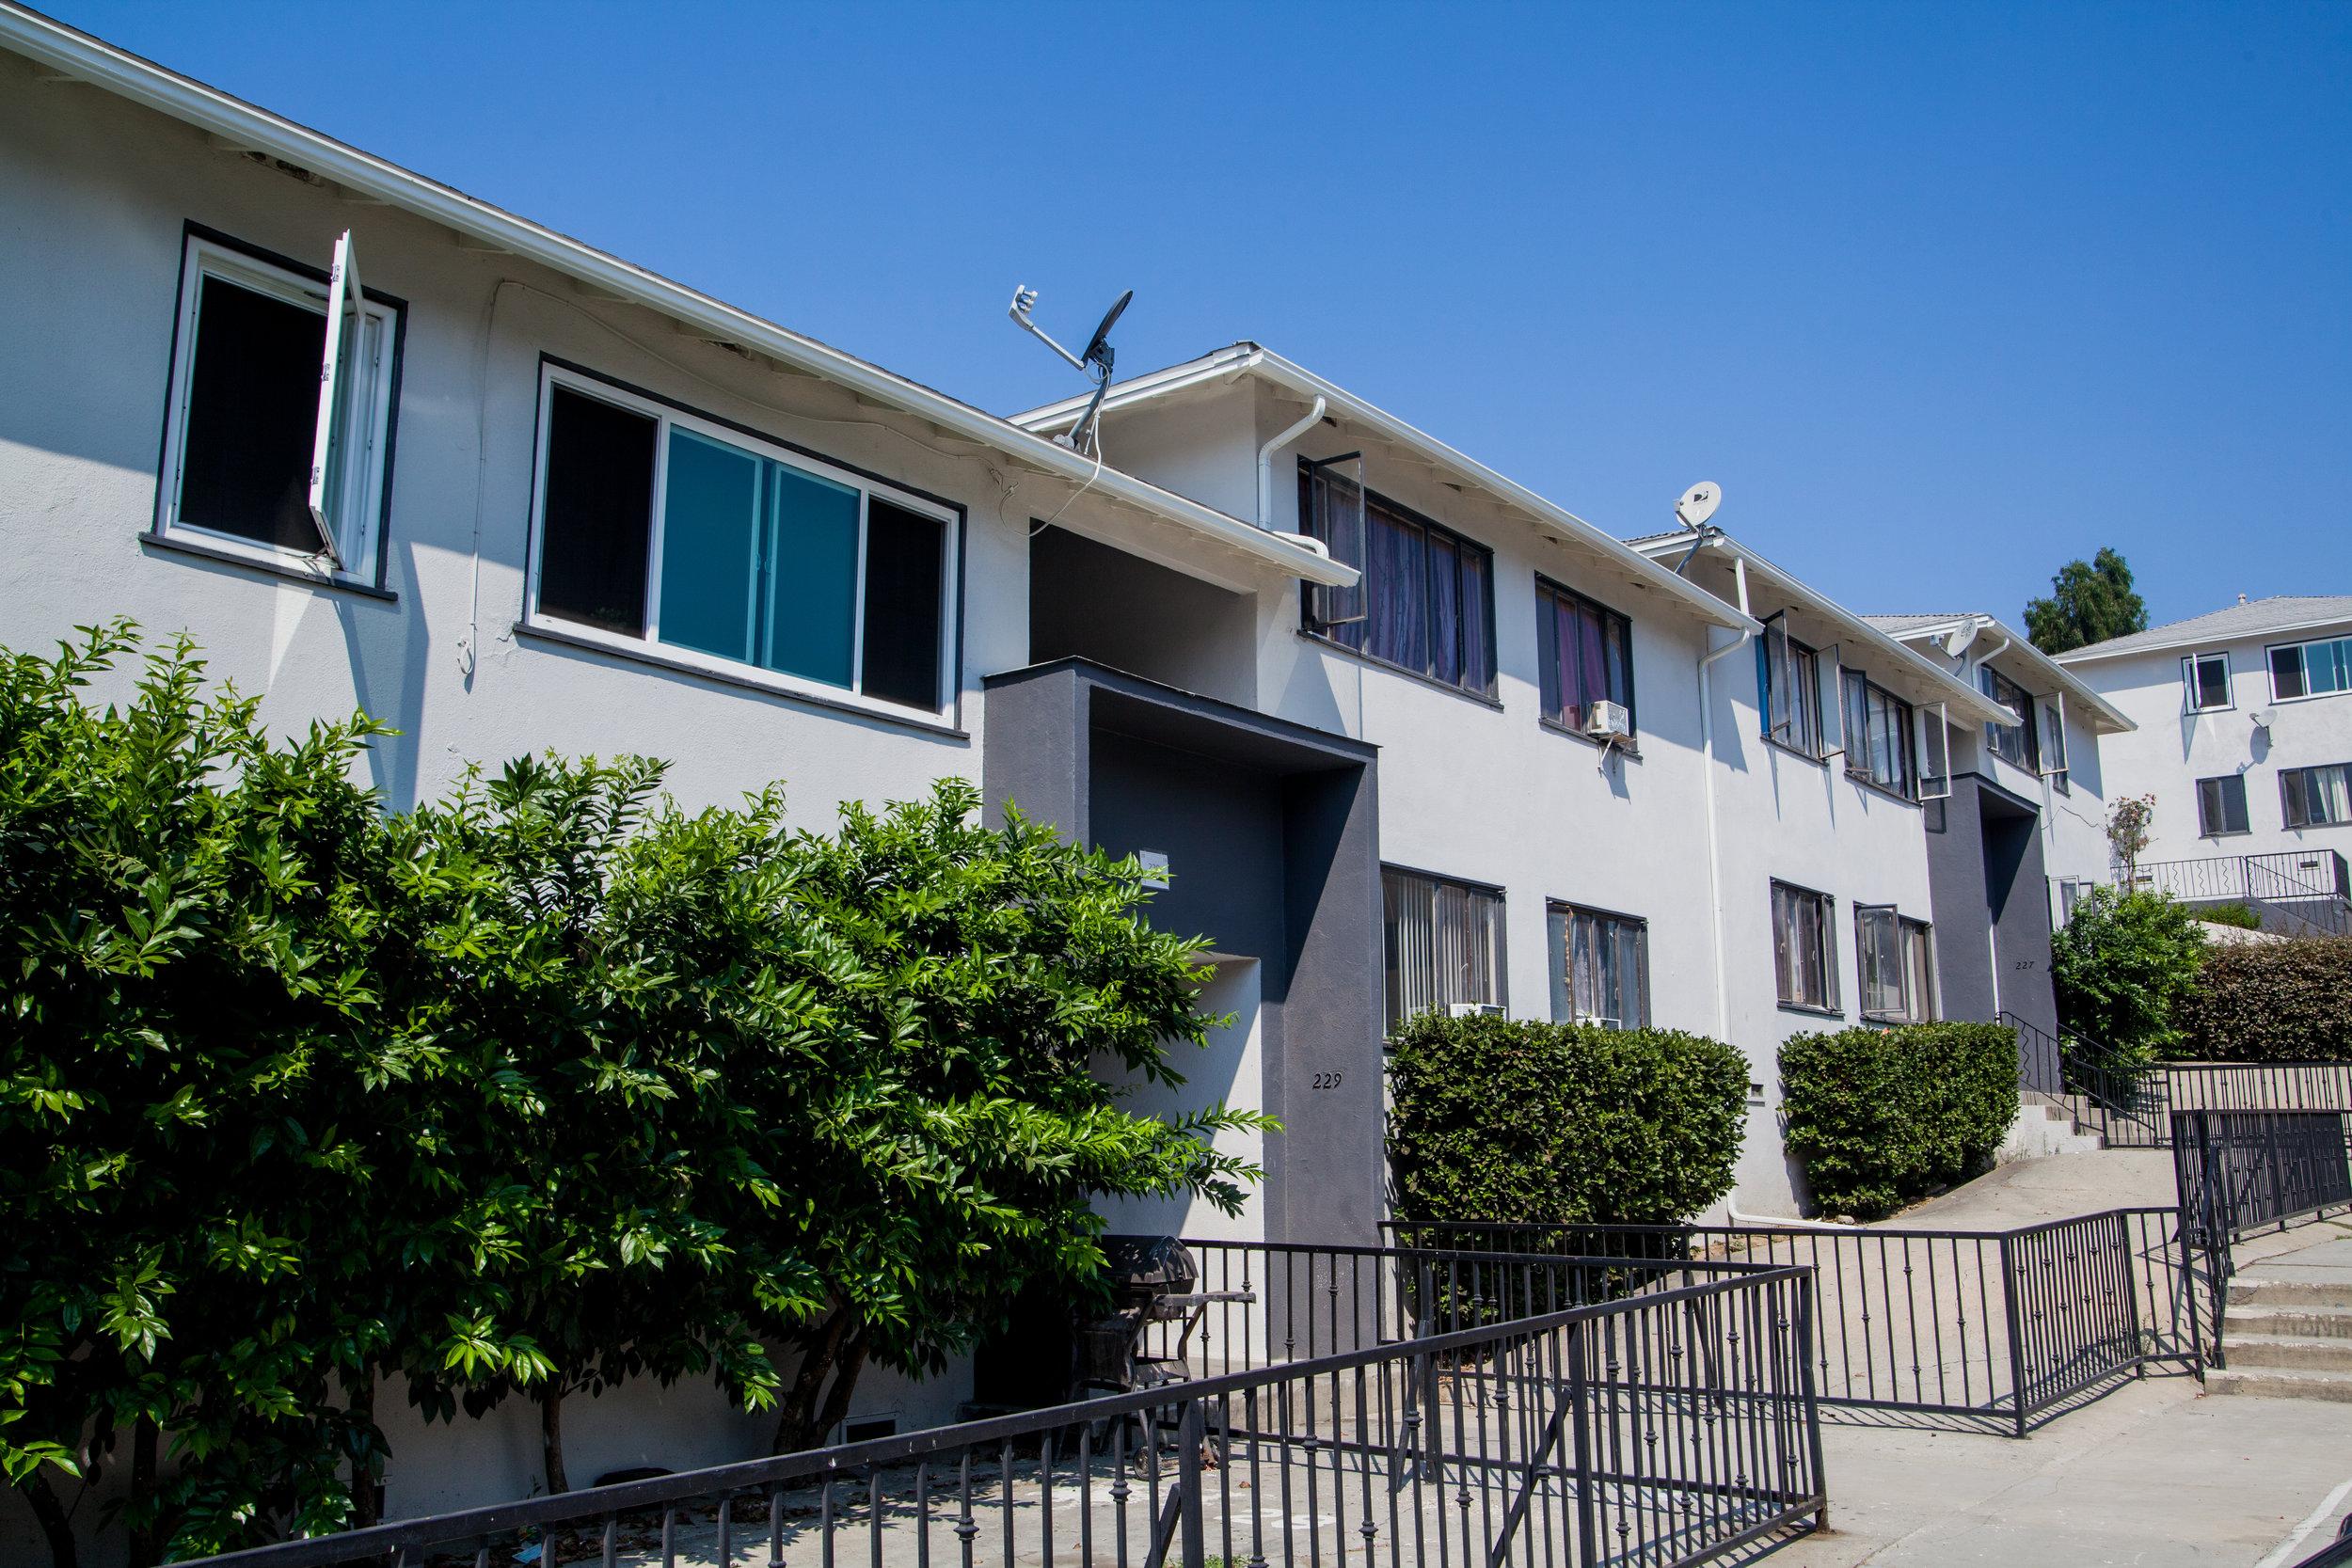 221 Union Pl., Los Angeles, CA - 20 UNITS